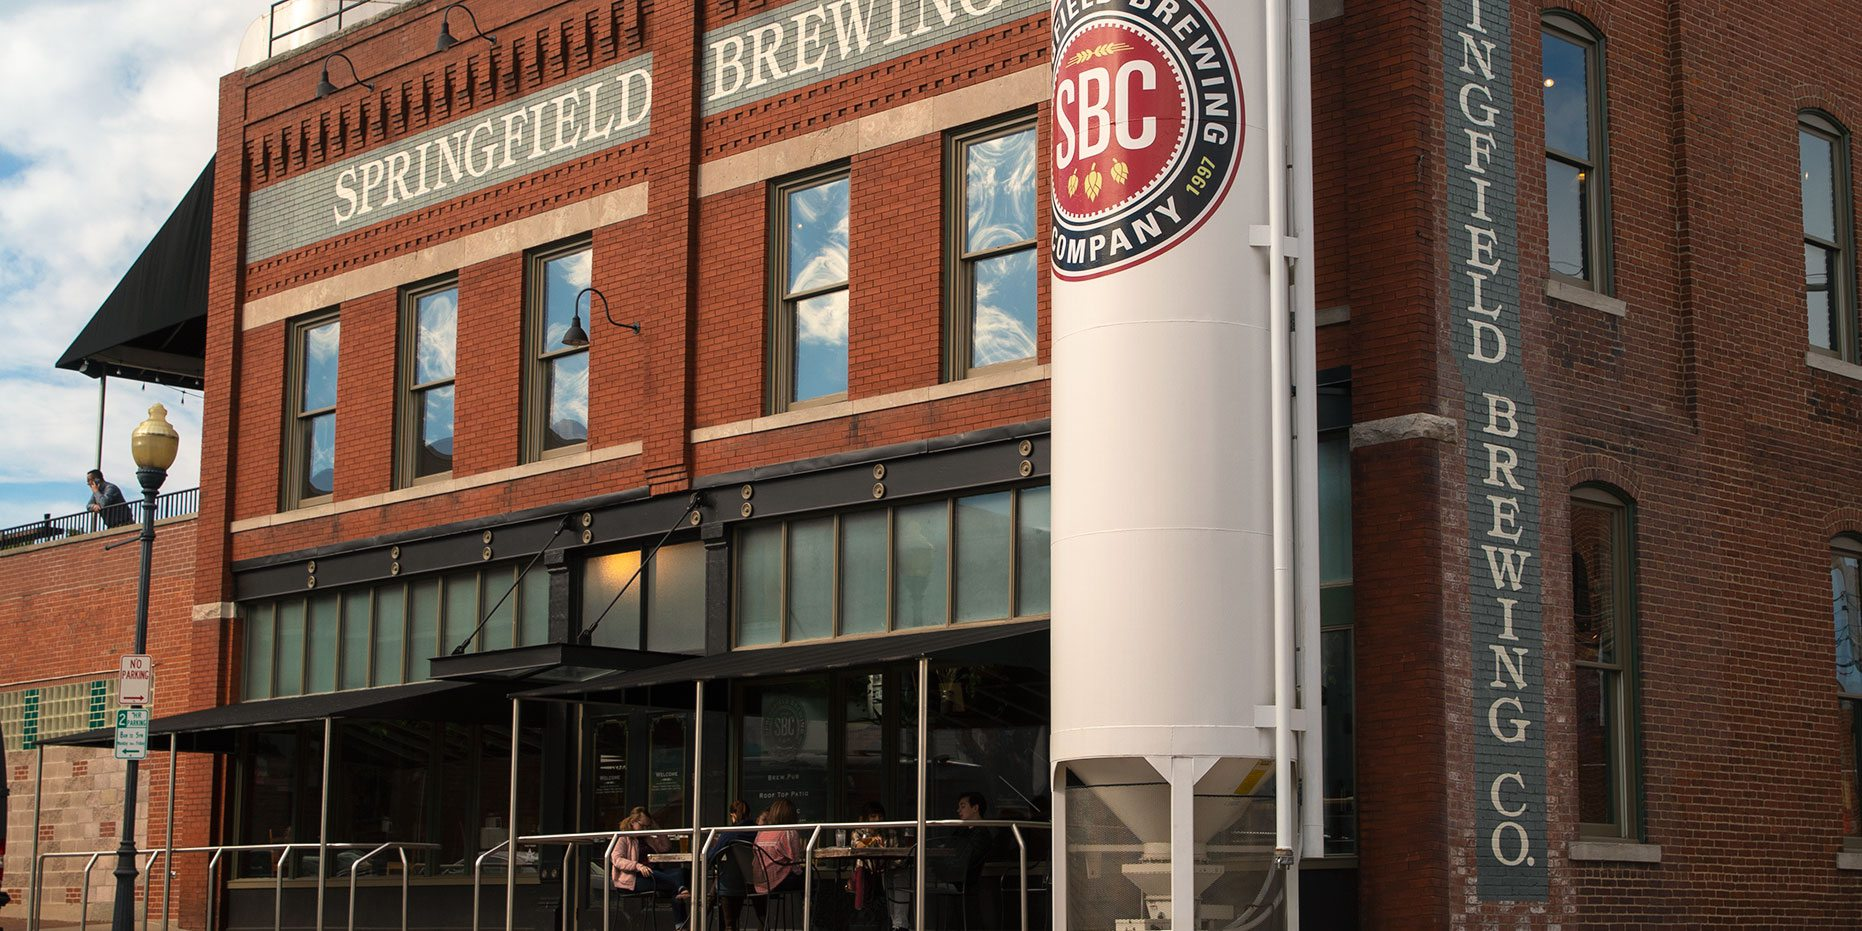 https://brewery.springfieldbrewingco.com/wp-content/uploads/2021/04/sbc-front.jpg